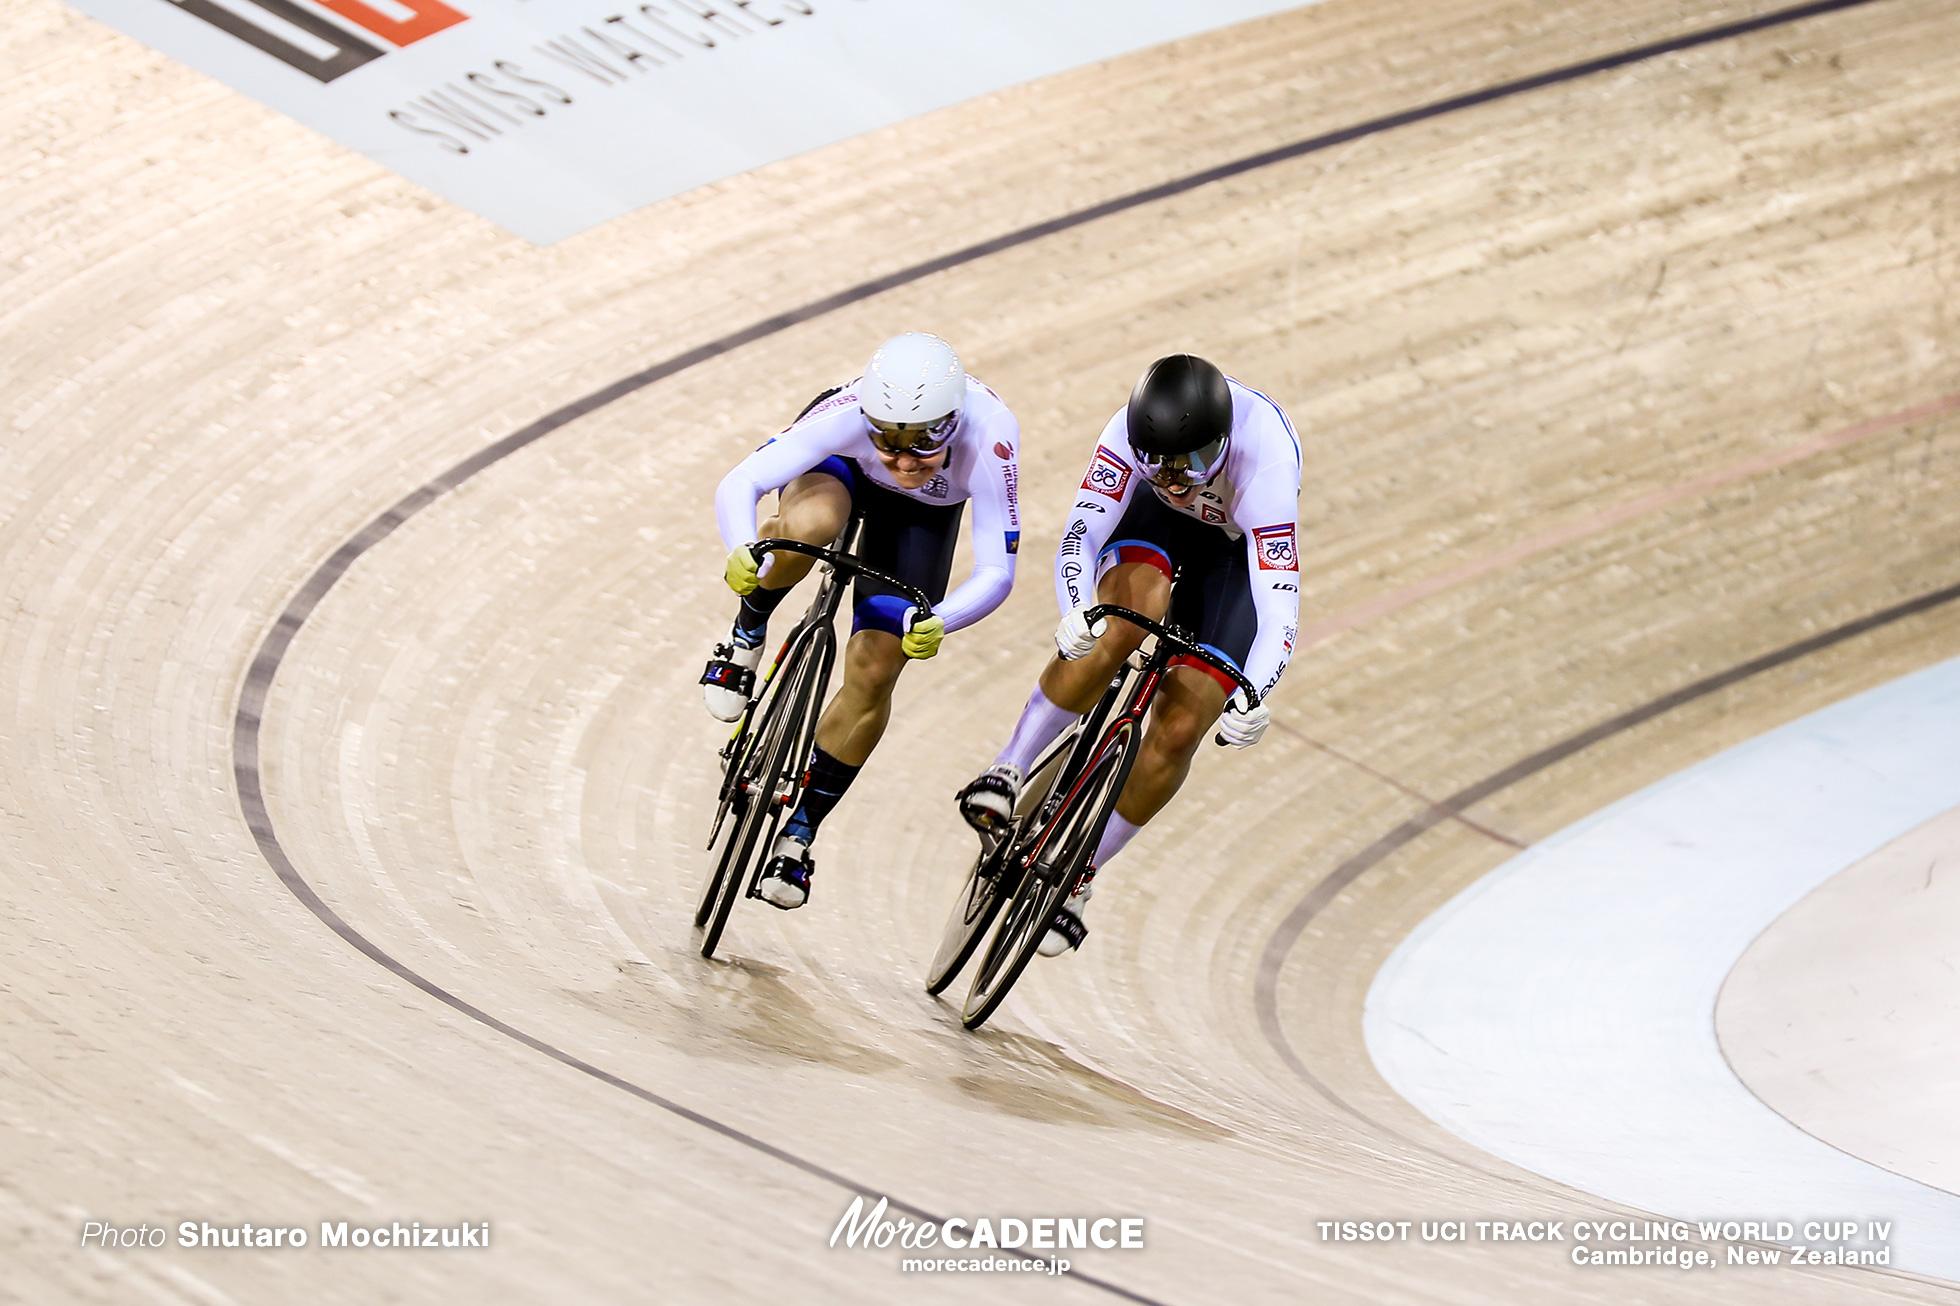 Final / Women's Sprint / TISSOT UCI TRACK CYCLING WORLD CUP IV, Cambridge, New Zealand, Anastasiia VOINOVA アナスタシア・ボイノワ Kelsey MITCHELL ケルシー・ミシェル